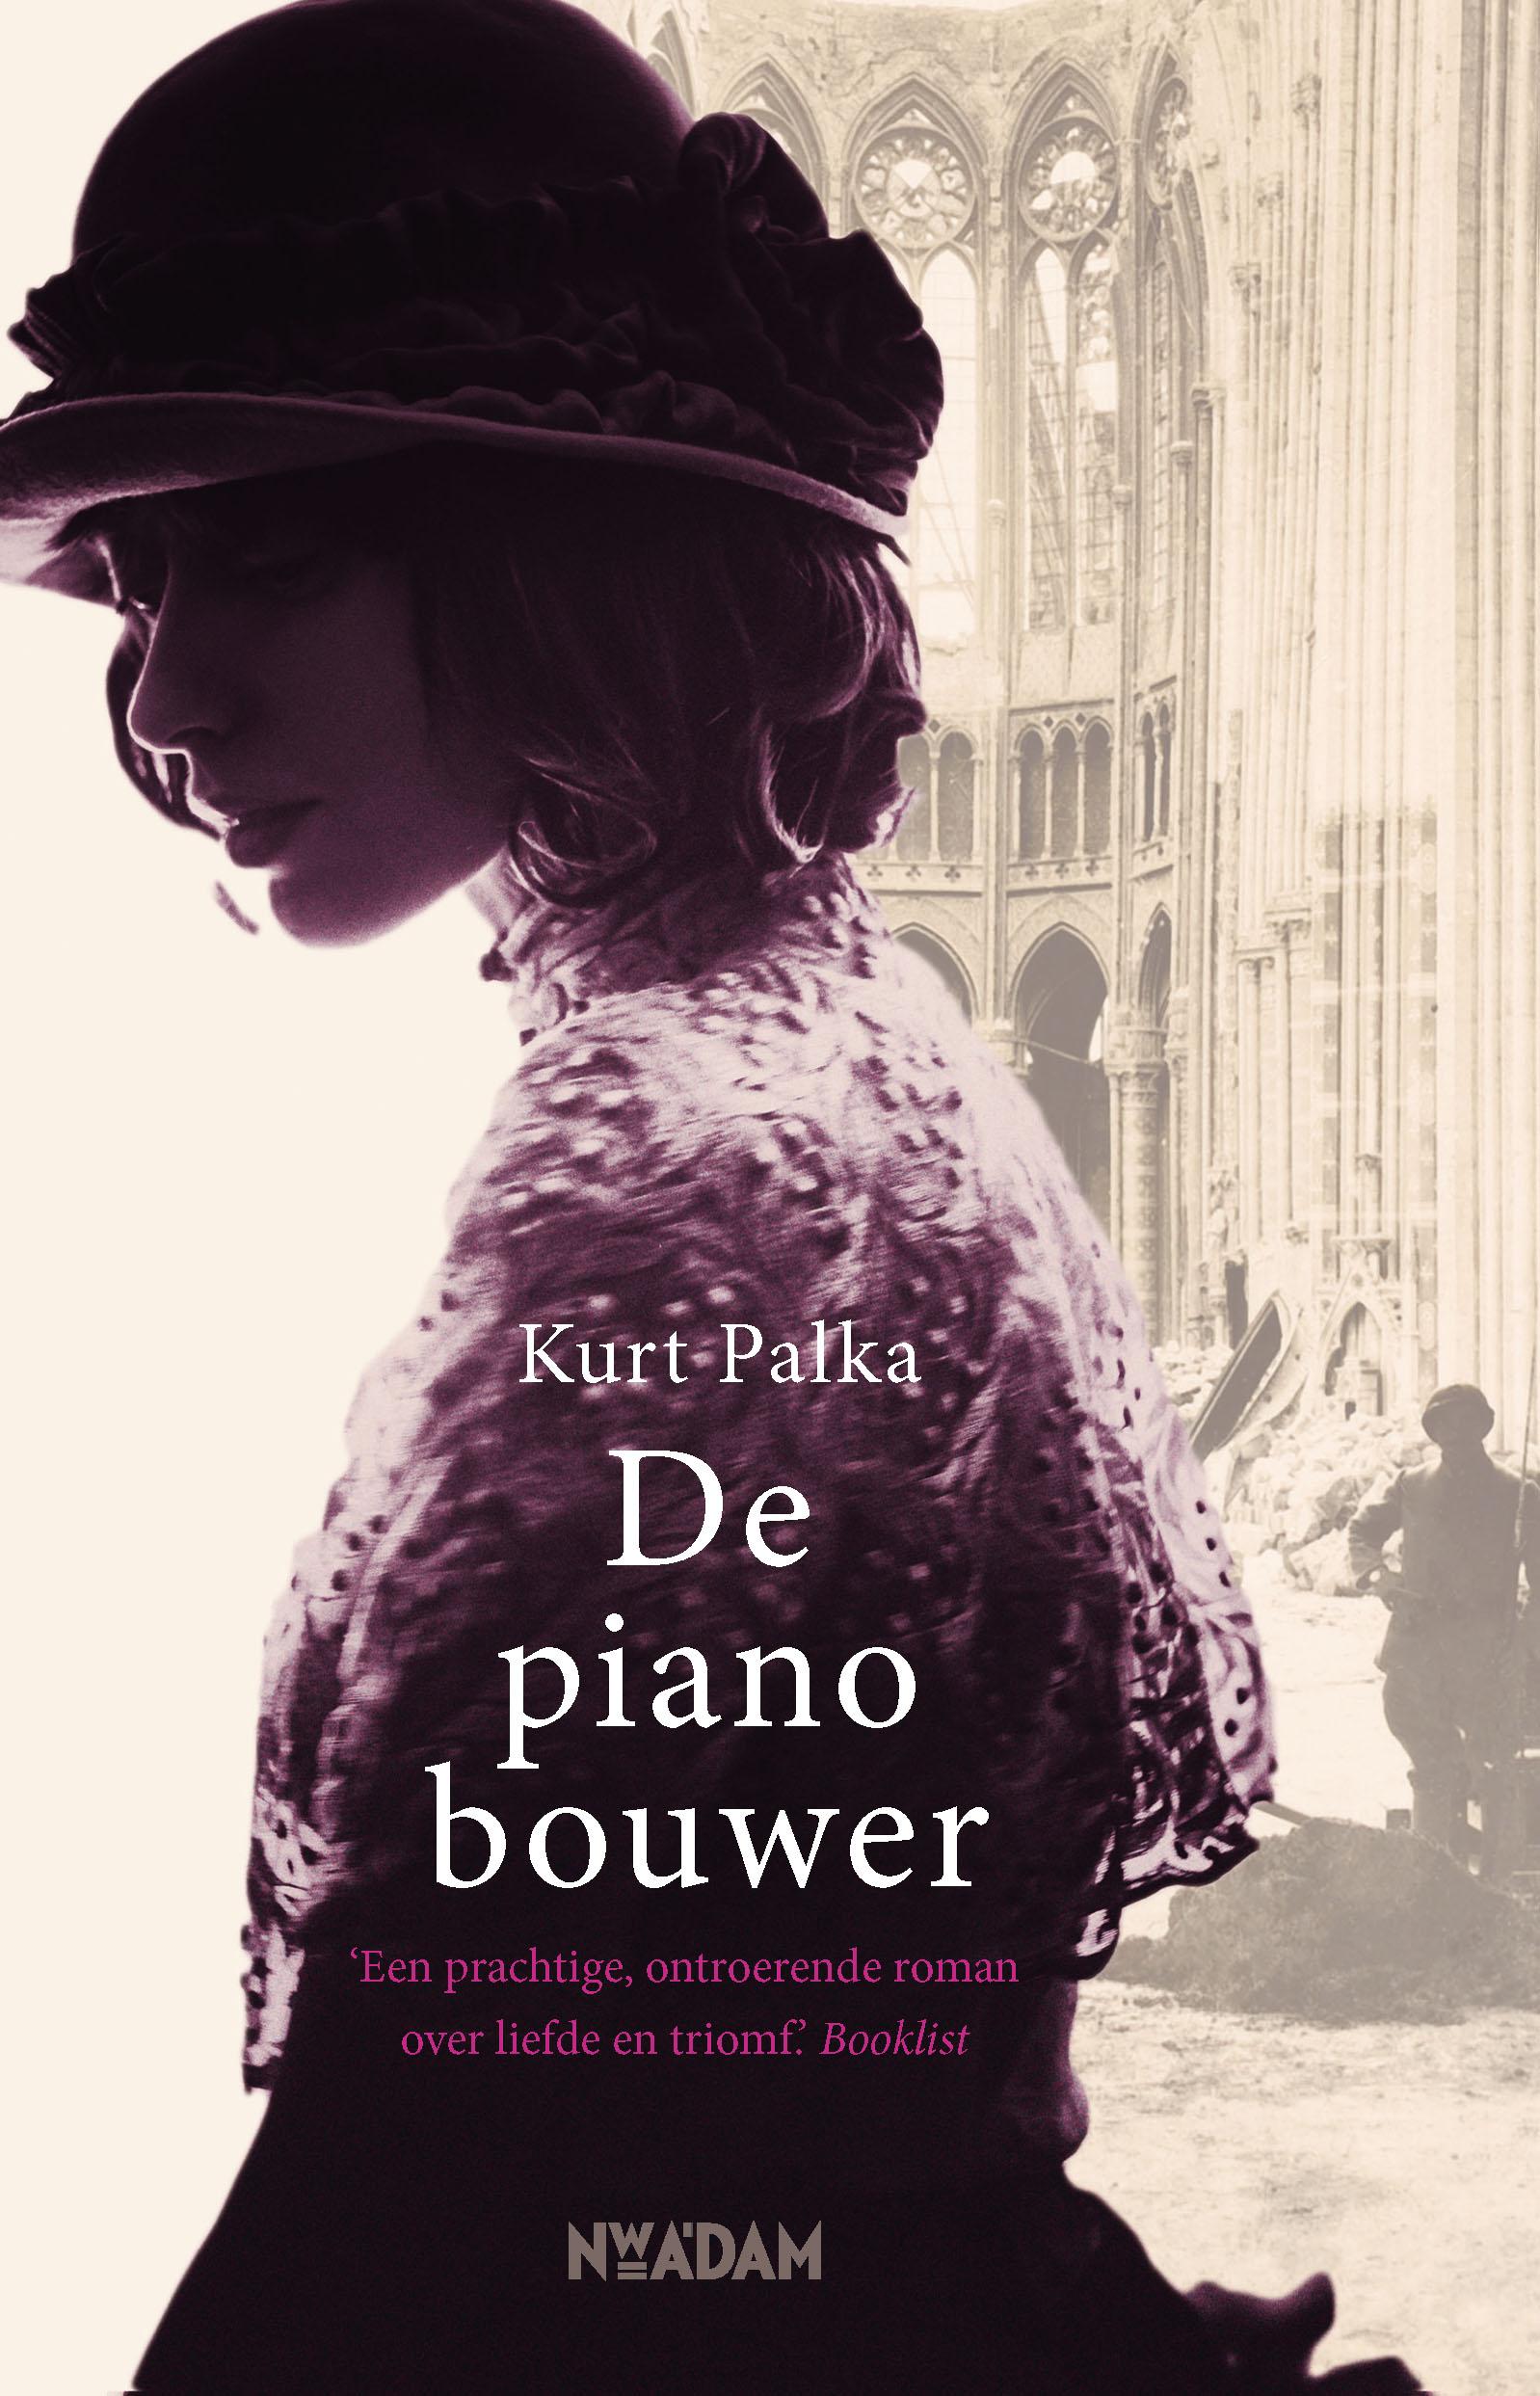 De pianobouwer – Kurt Palka